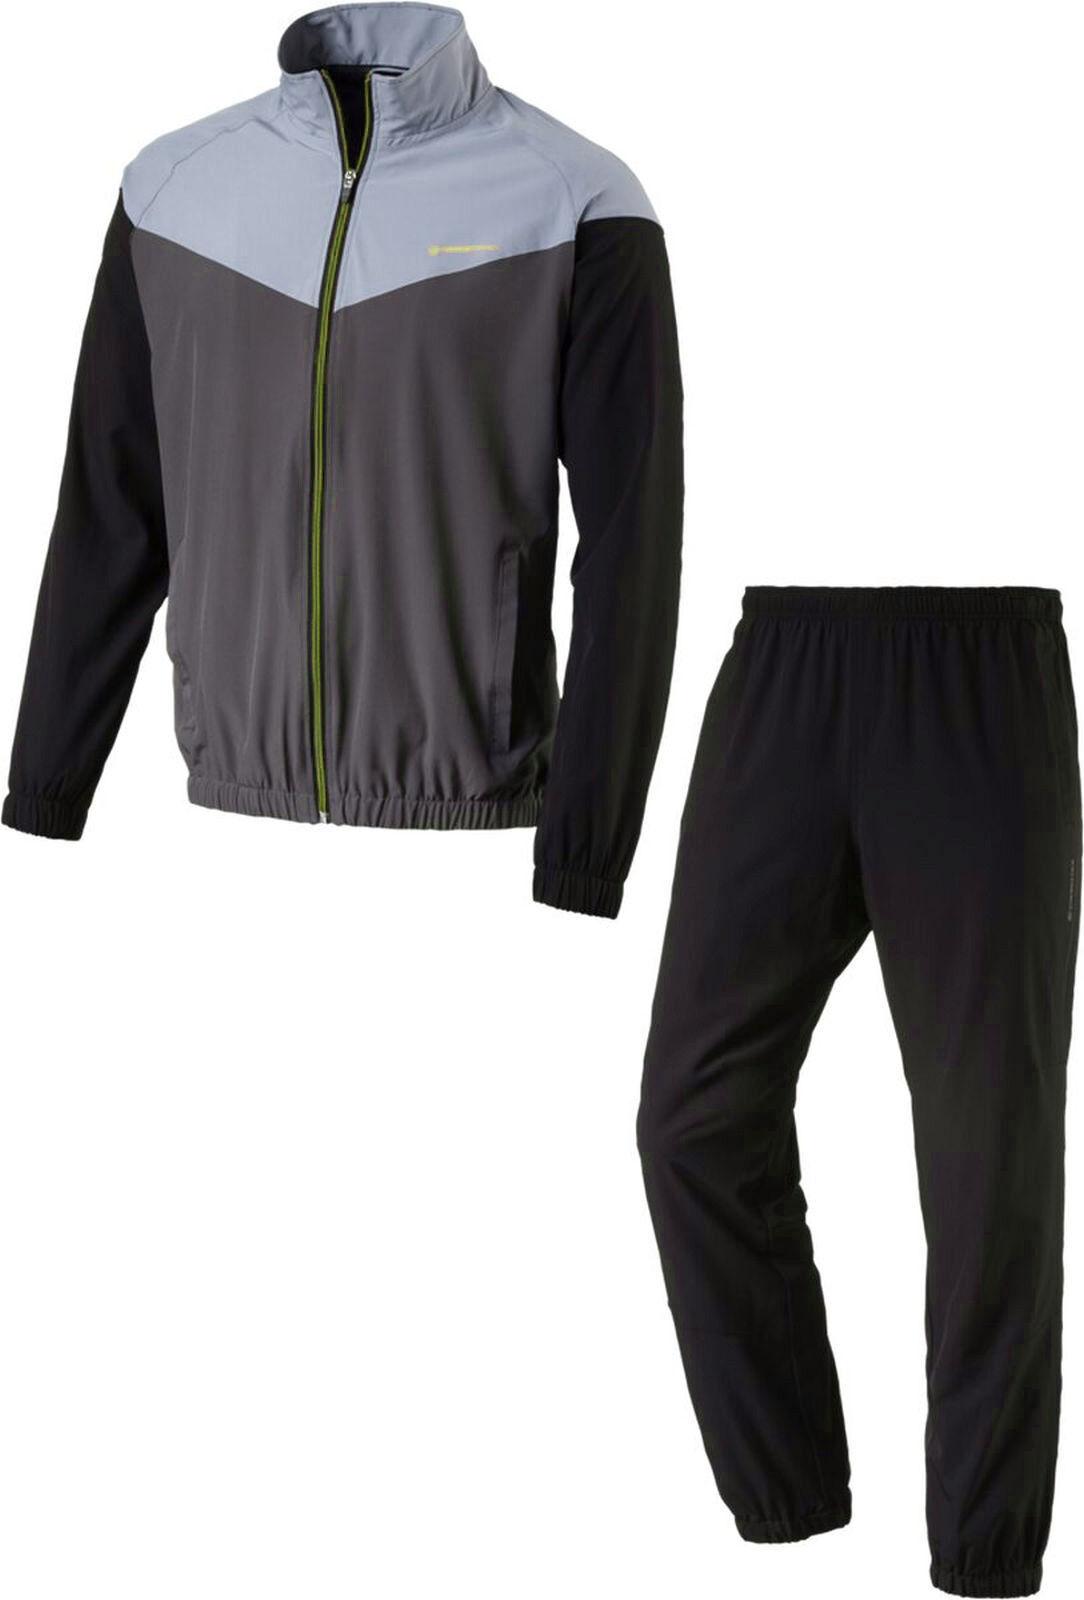 Energetics Herren Präsentationsanzug Trainingsanzug FINLEY + FLO  grau schwarz